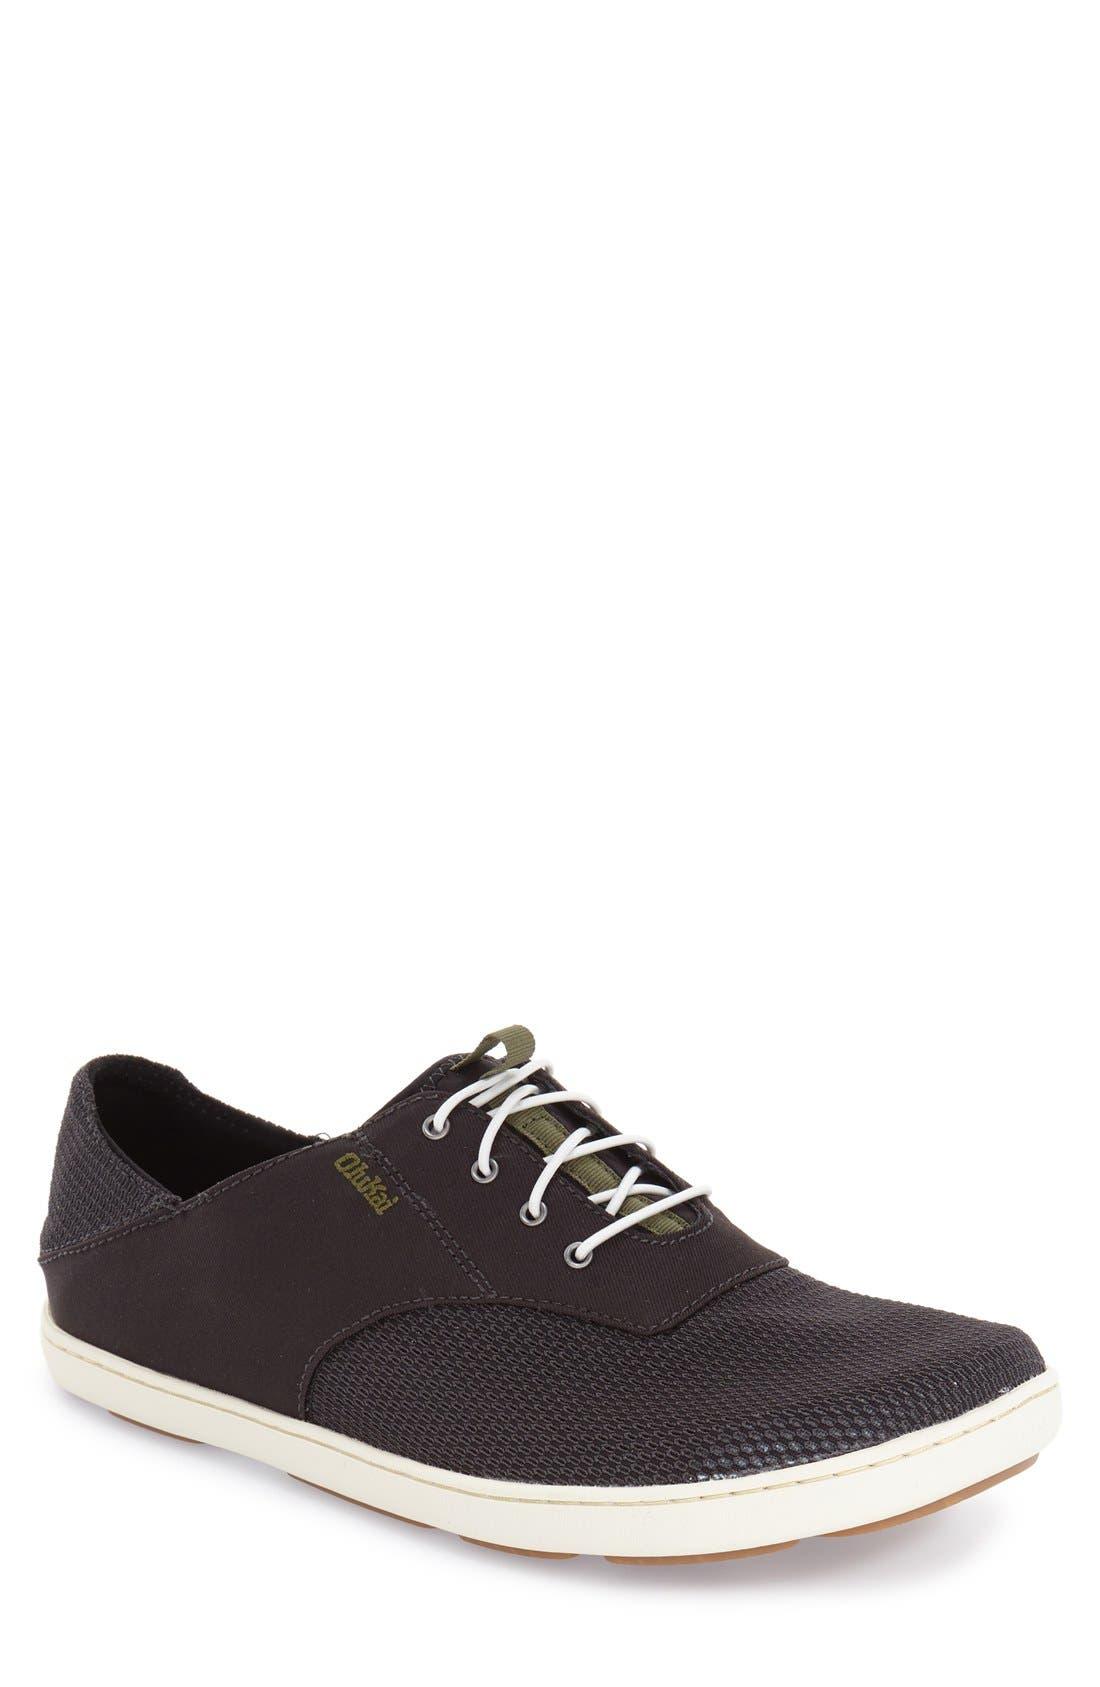 'Nohea Moku' Sneaker,                         Main,                         color, Black/ Black